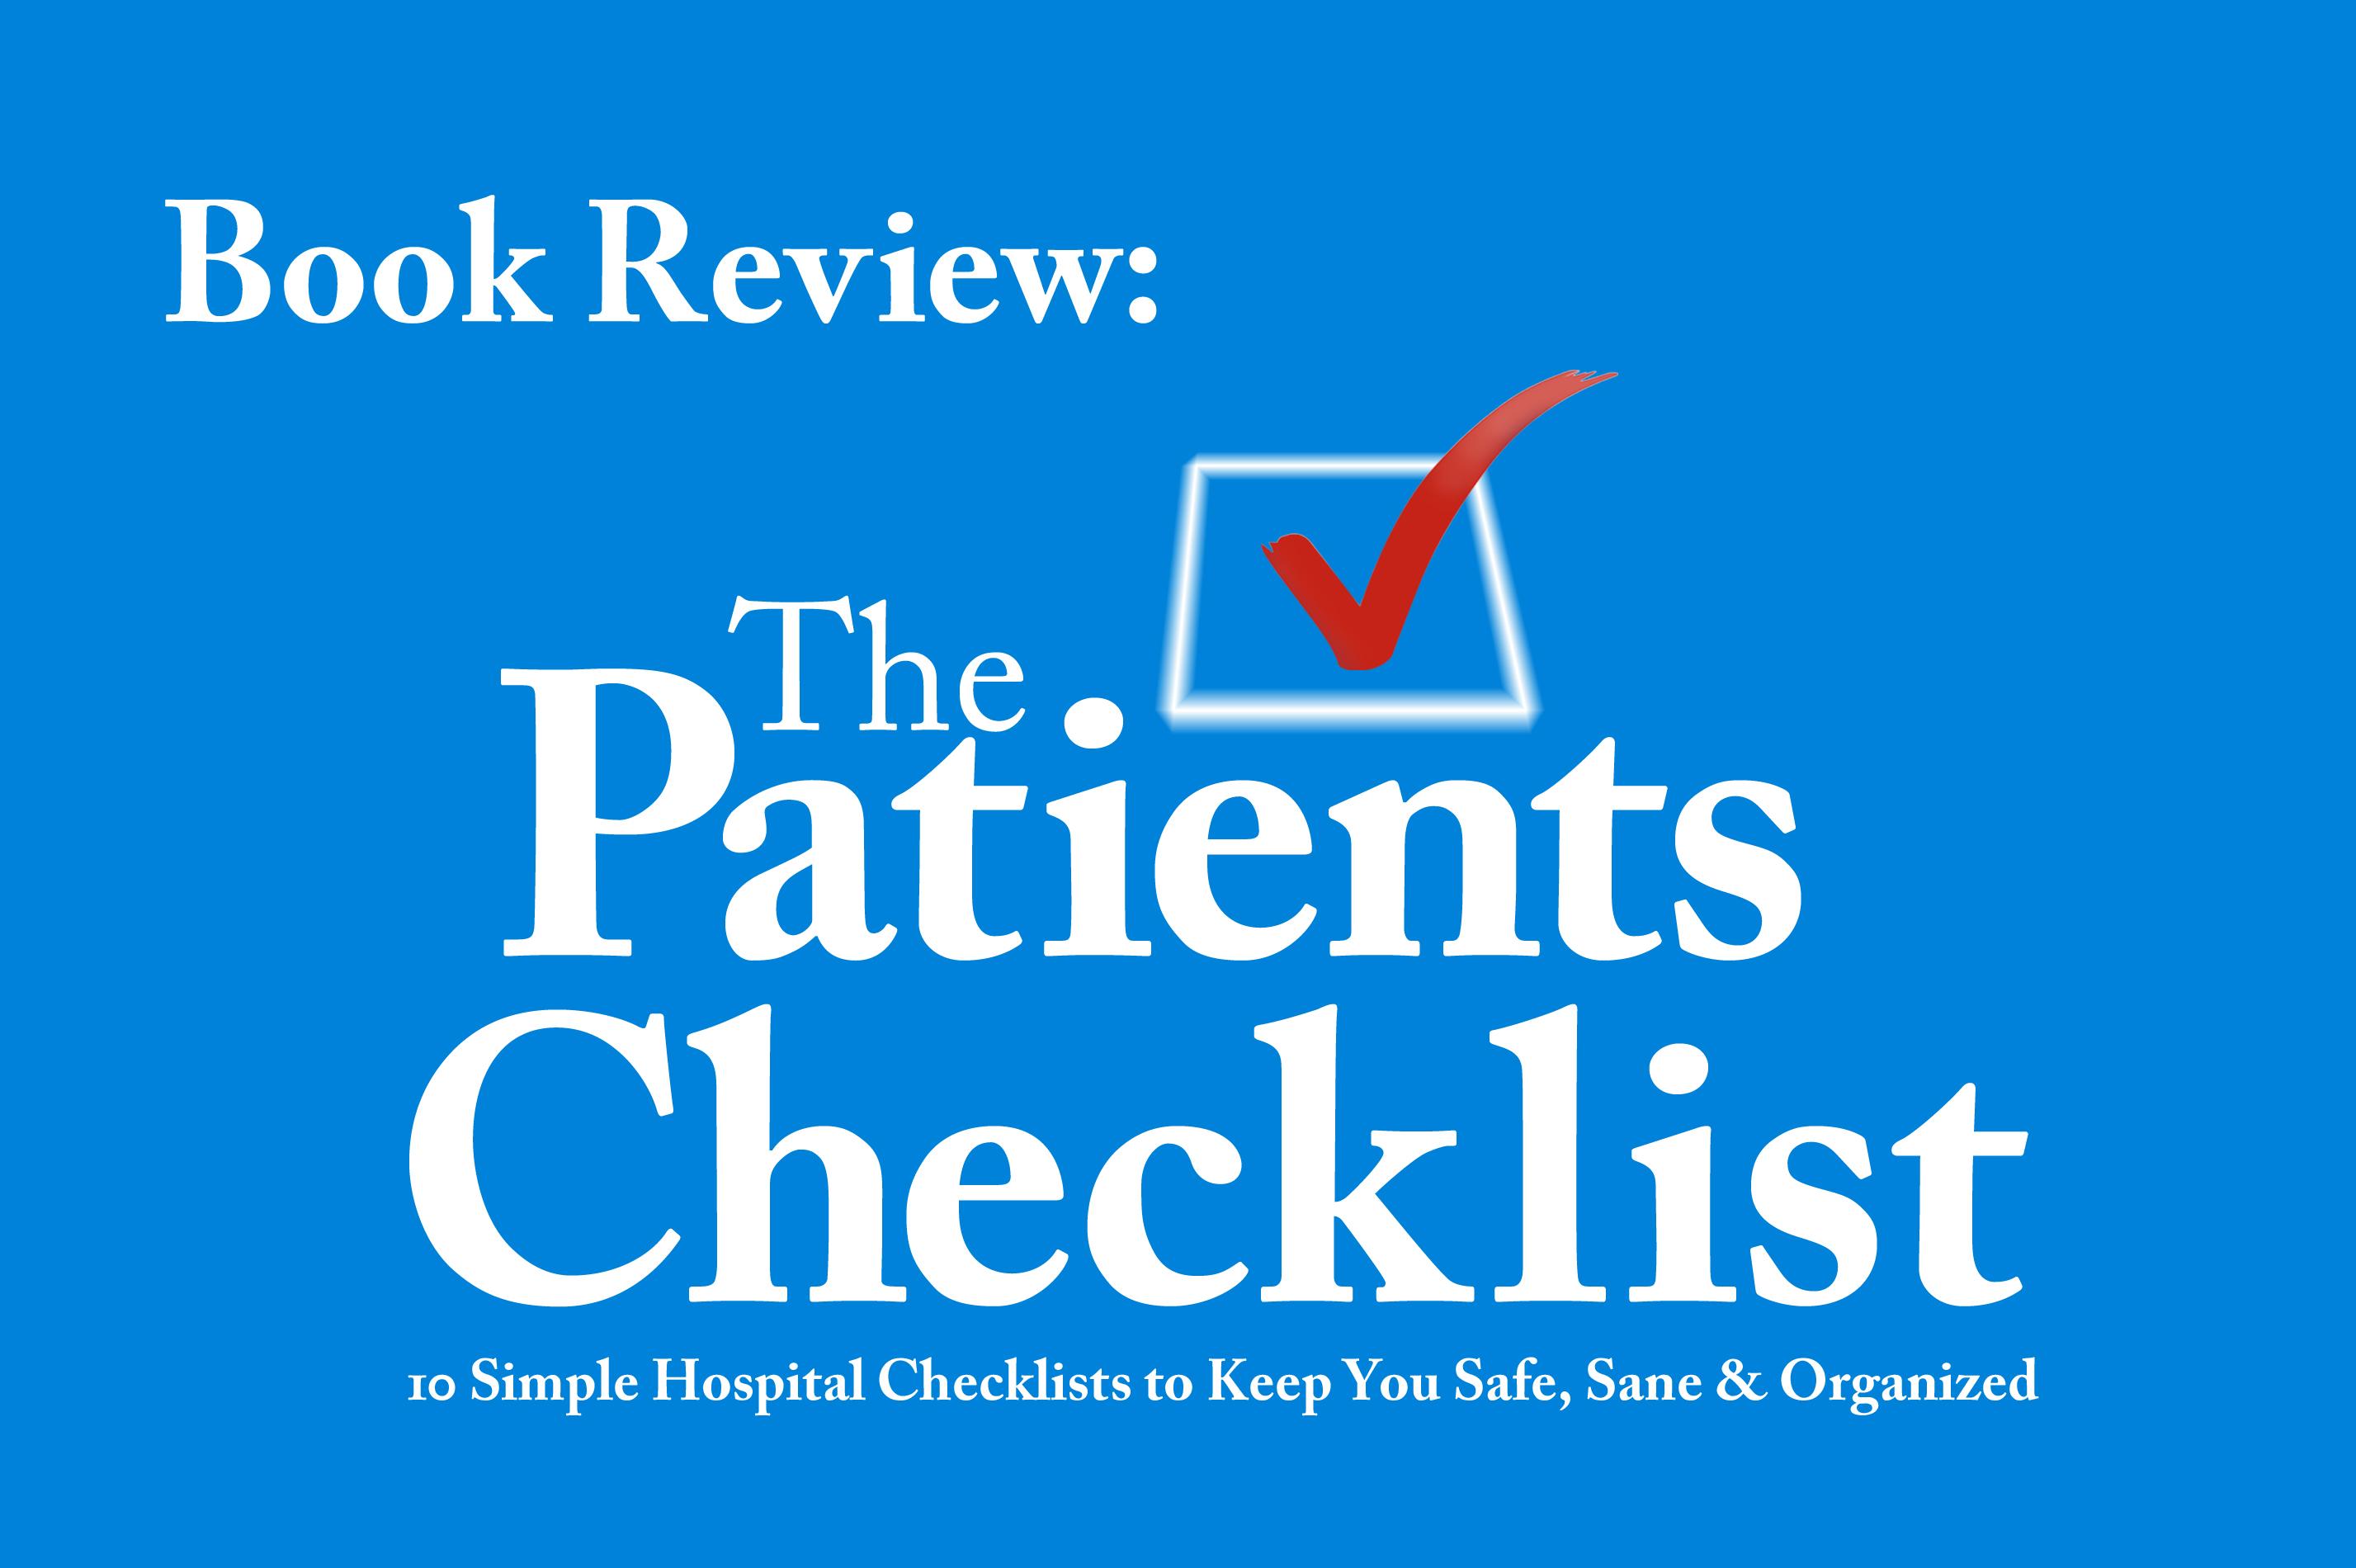 10 Simple Hospital Checklists By Elizabeth Bailey